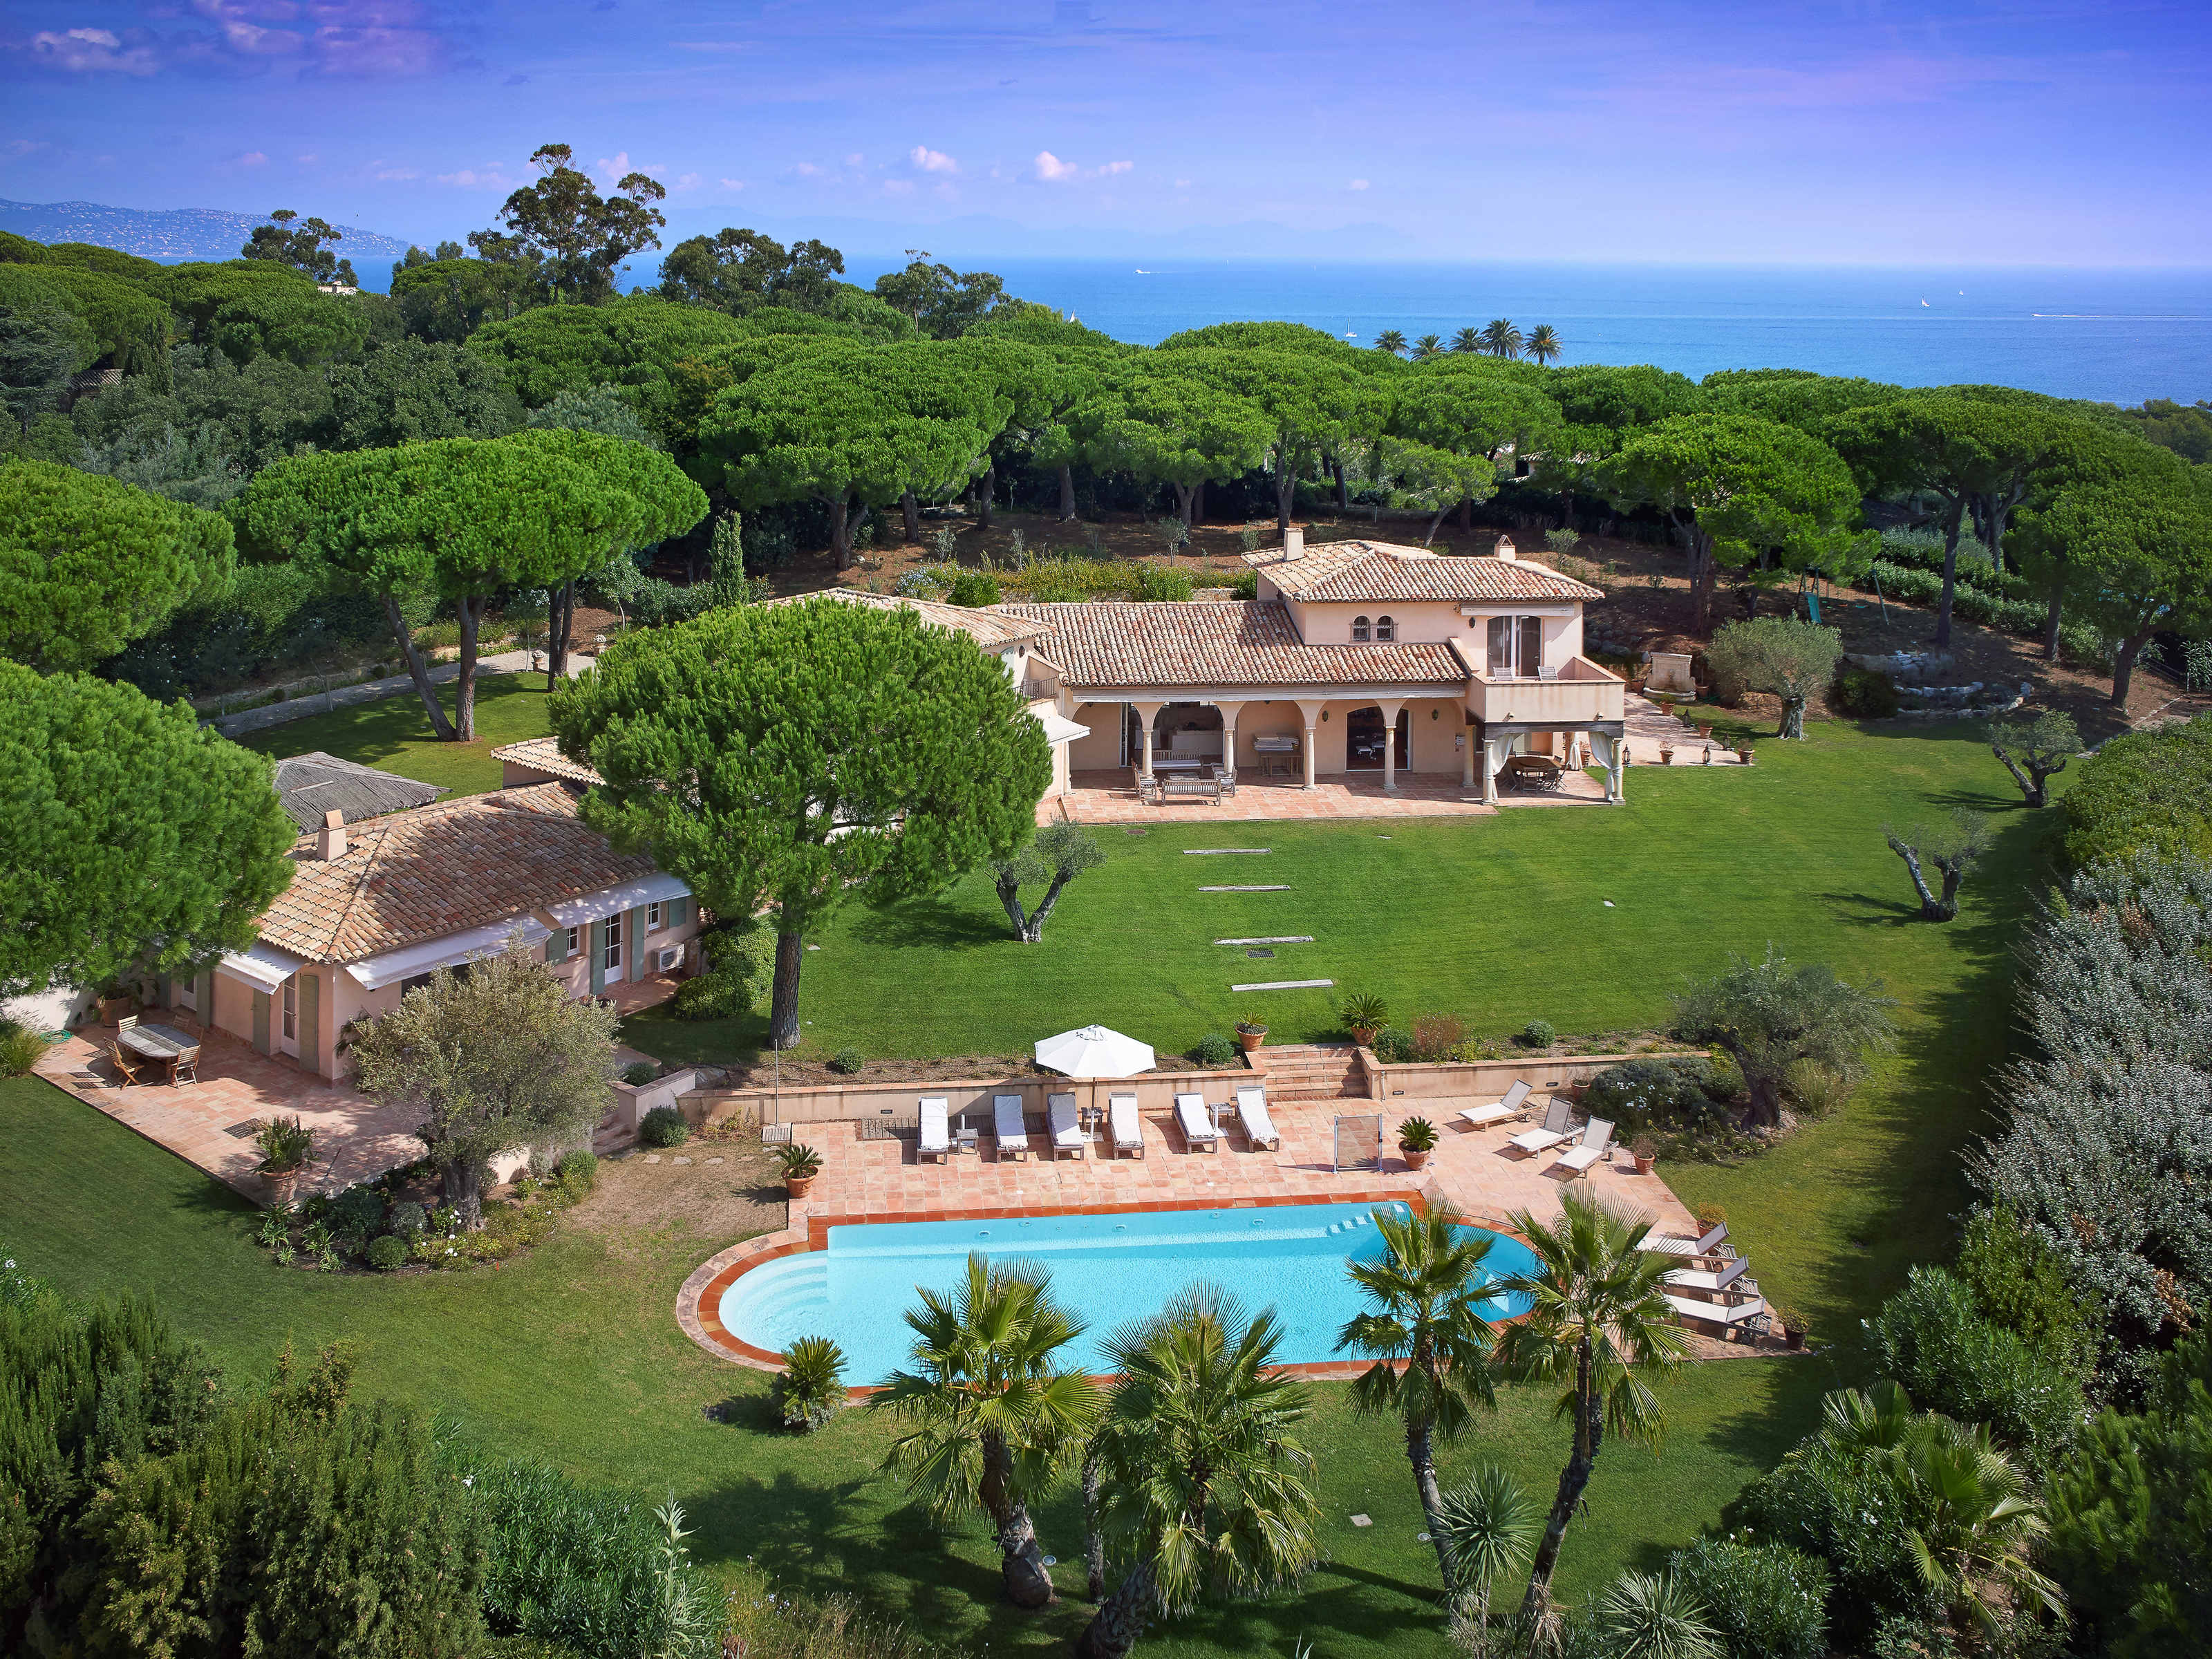 Villa per Vendita alle ore Neo provencal Style property in Les Parcs de Saint-Tropez Saint Tropez, Provenza-Alpi-Costa Azzurra 83990 Francia